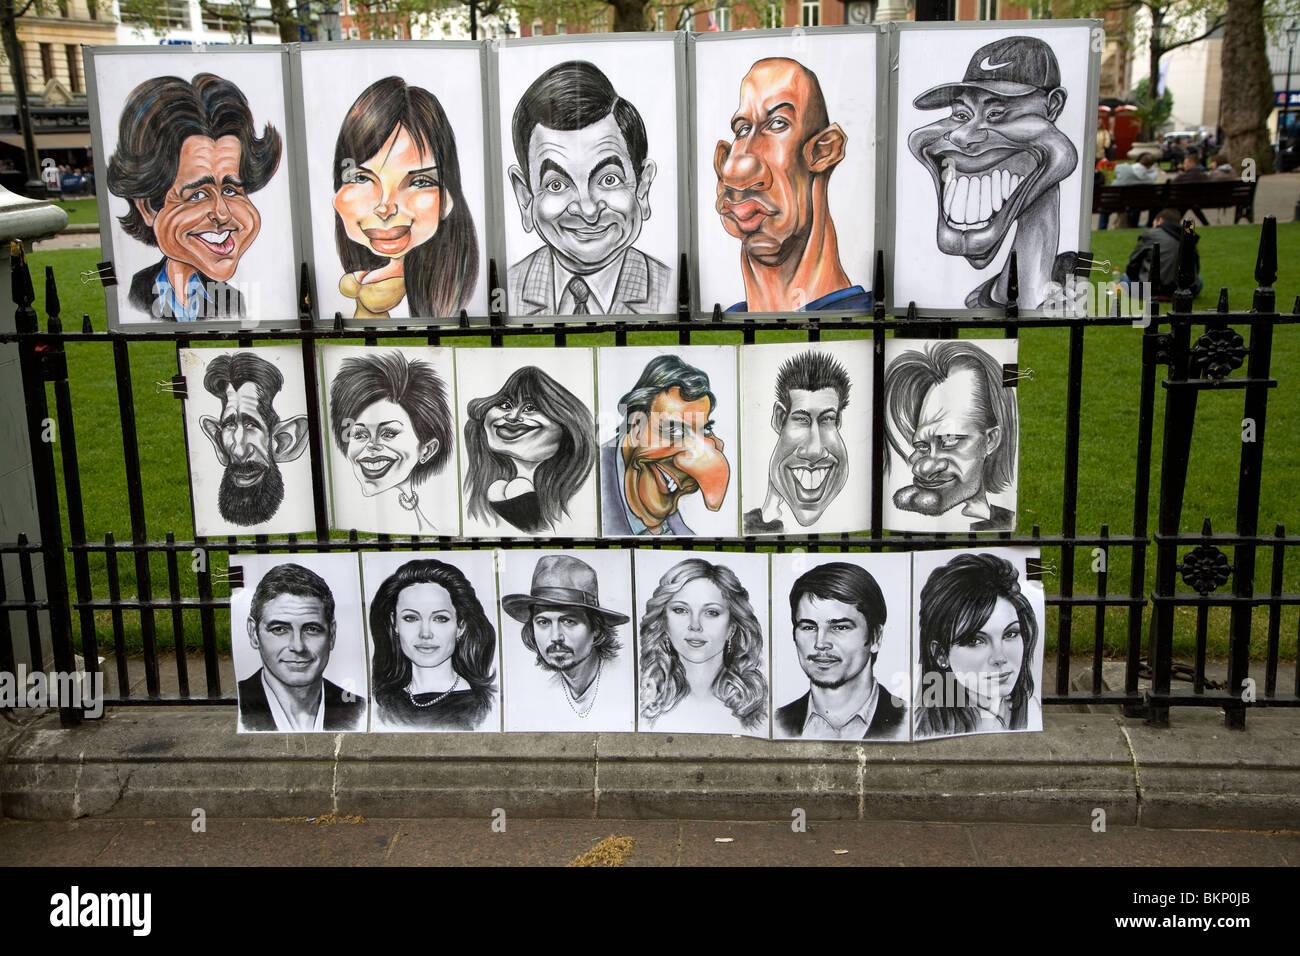 Street portrait artist cartoons famous people, Leicester ...